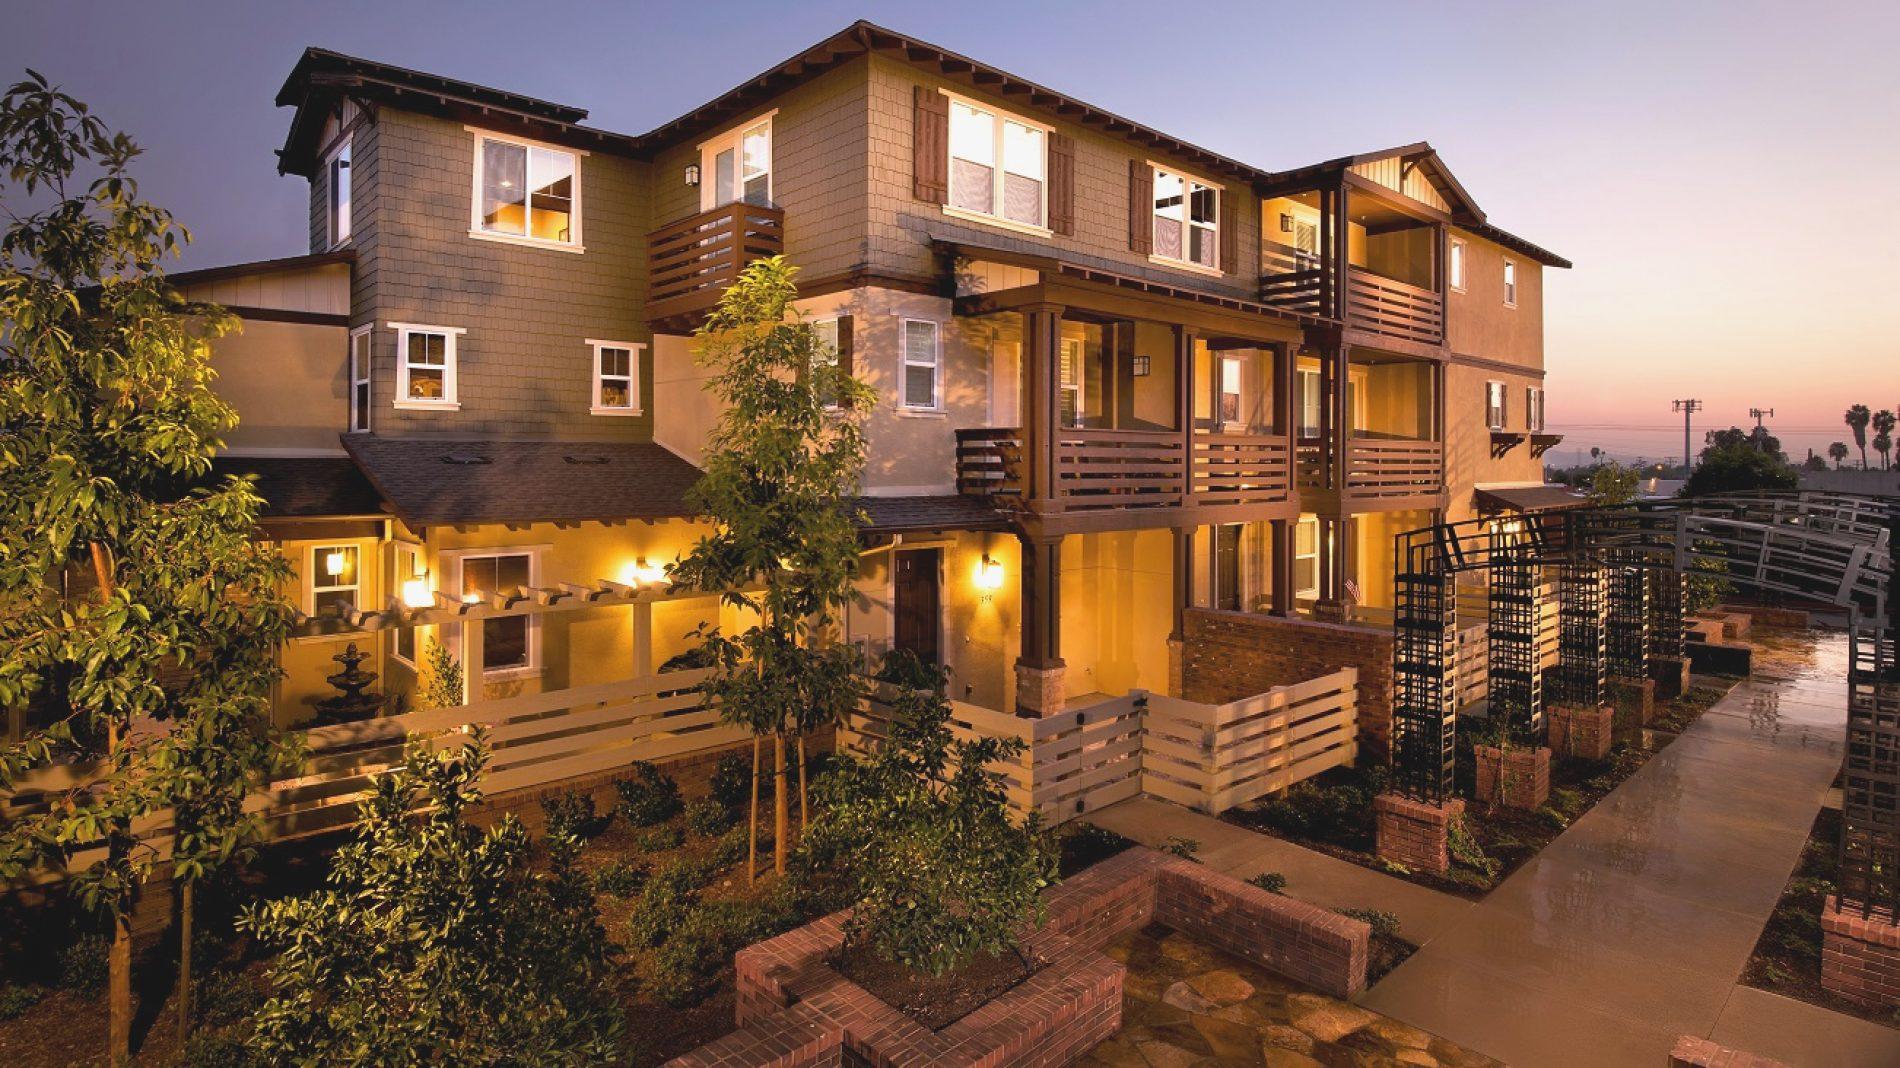 City Ventures Assembling 8.76 Acres in Glendora